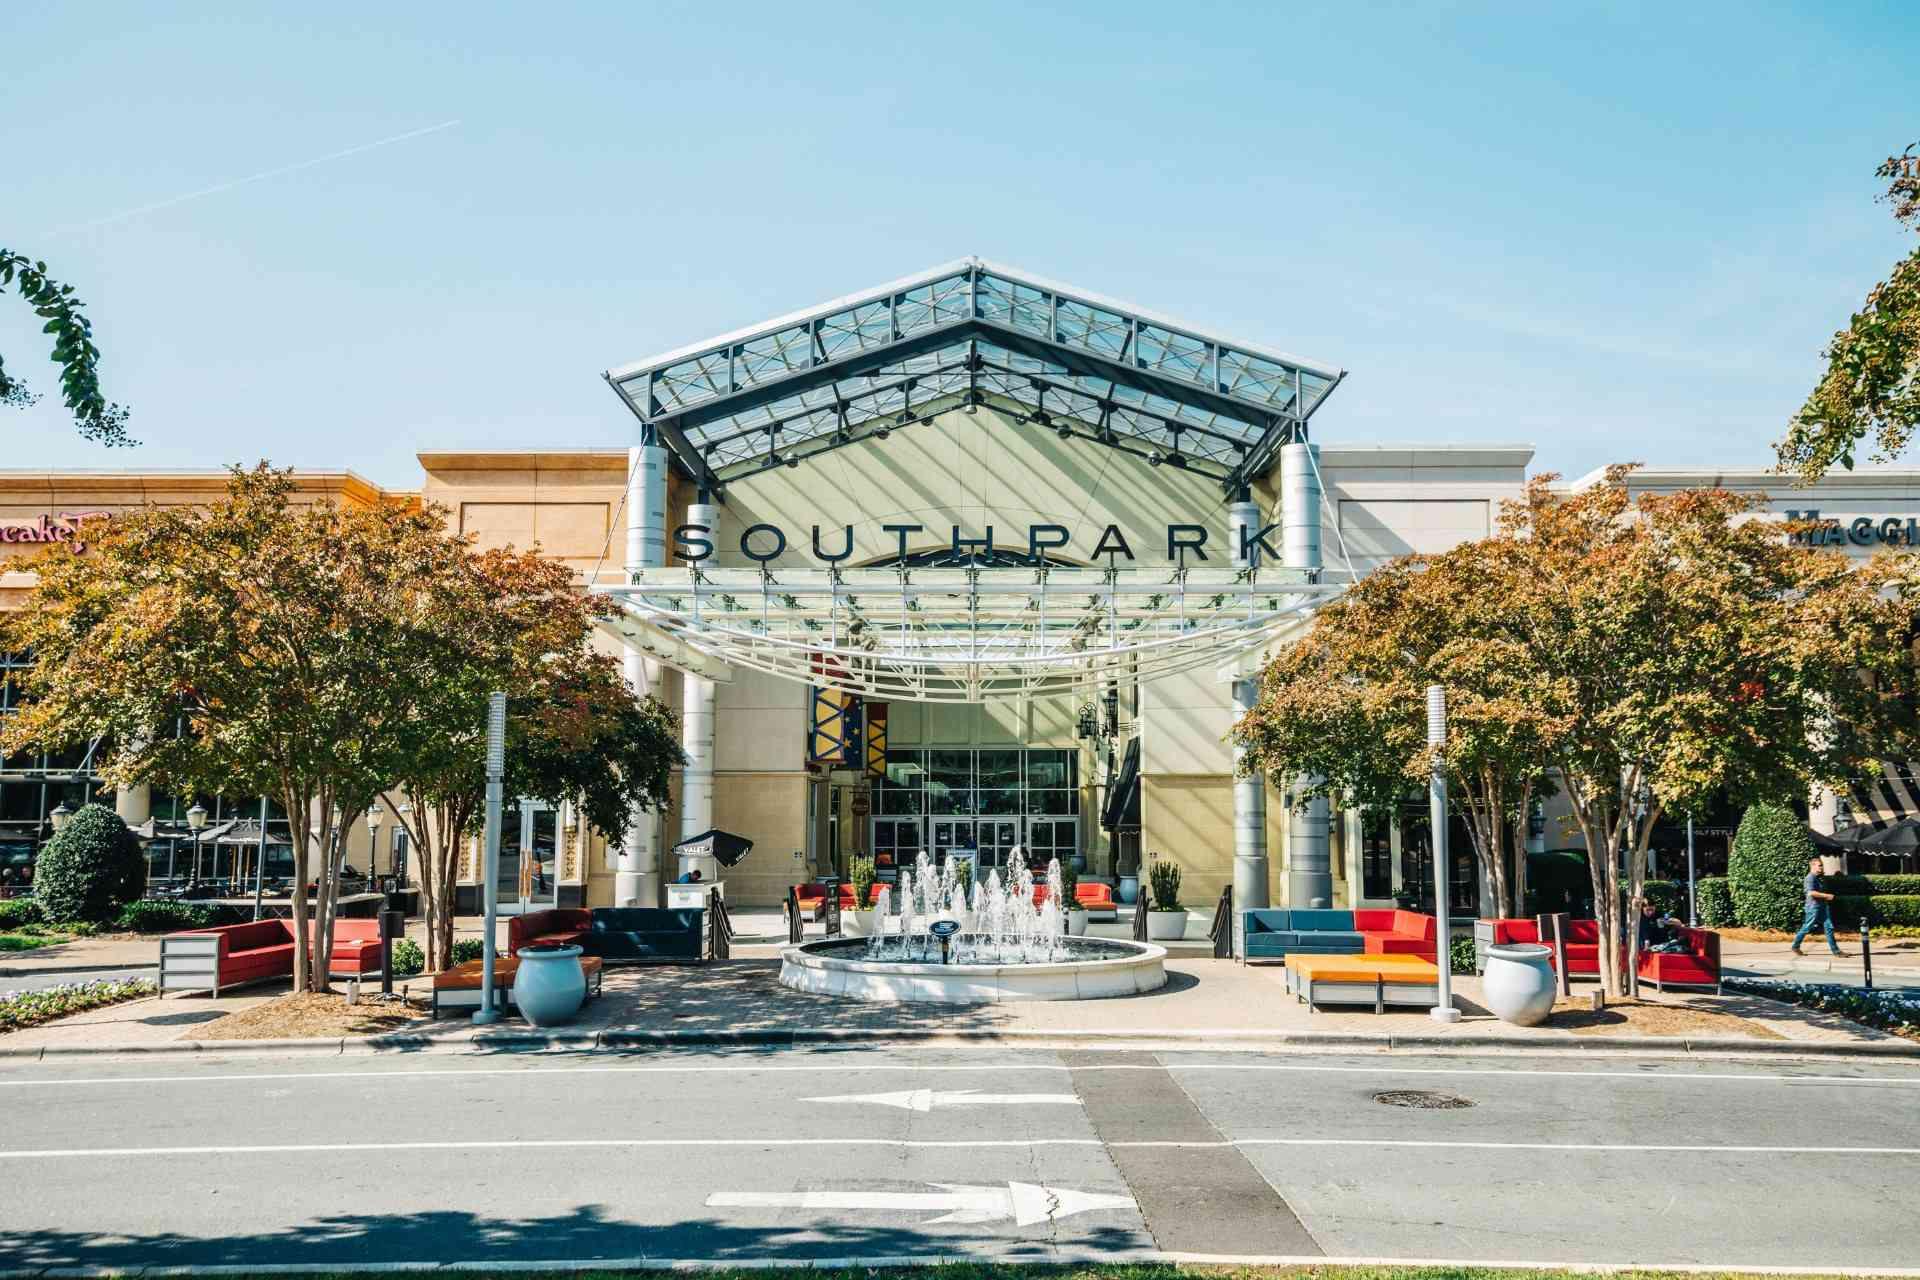 fuente frente a la entrada del centro comercial Southpark